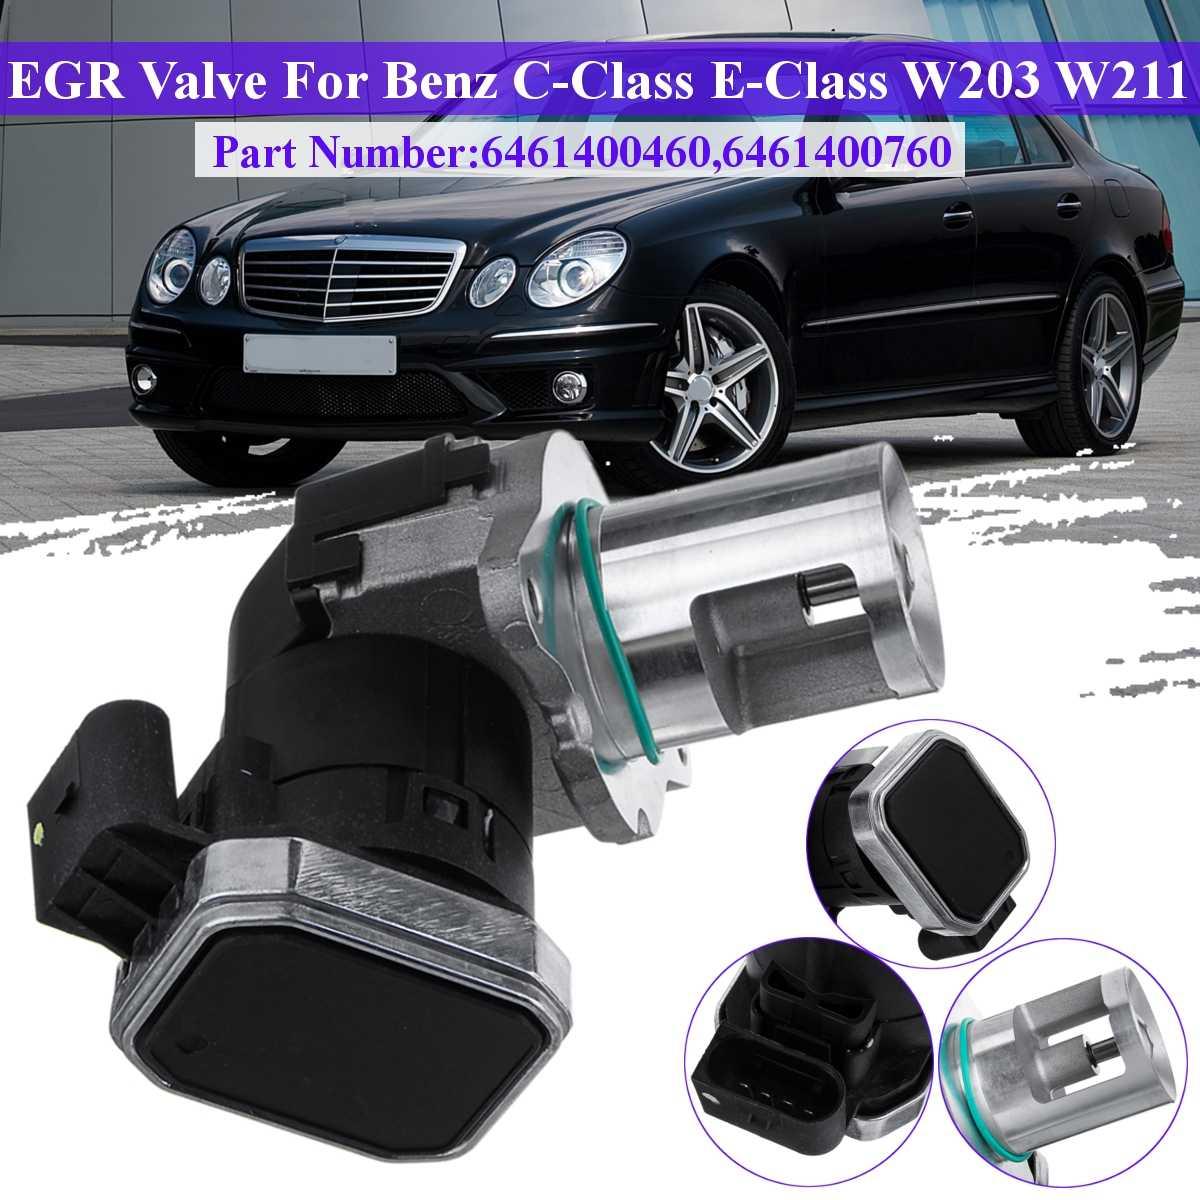 Auto Abgas Rückführung Ventil Agr-ventil Für Mercedes C-Klasse E-Klasse CLK W203 W211 S203 #6461400460 6461400760 zubehör